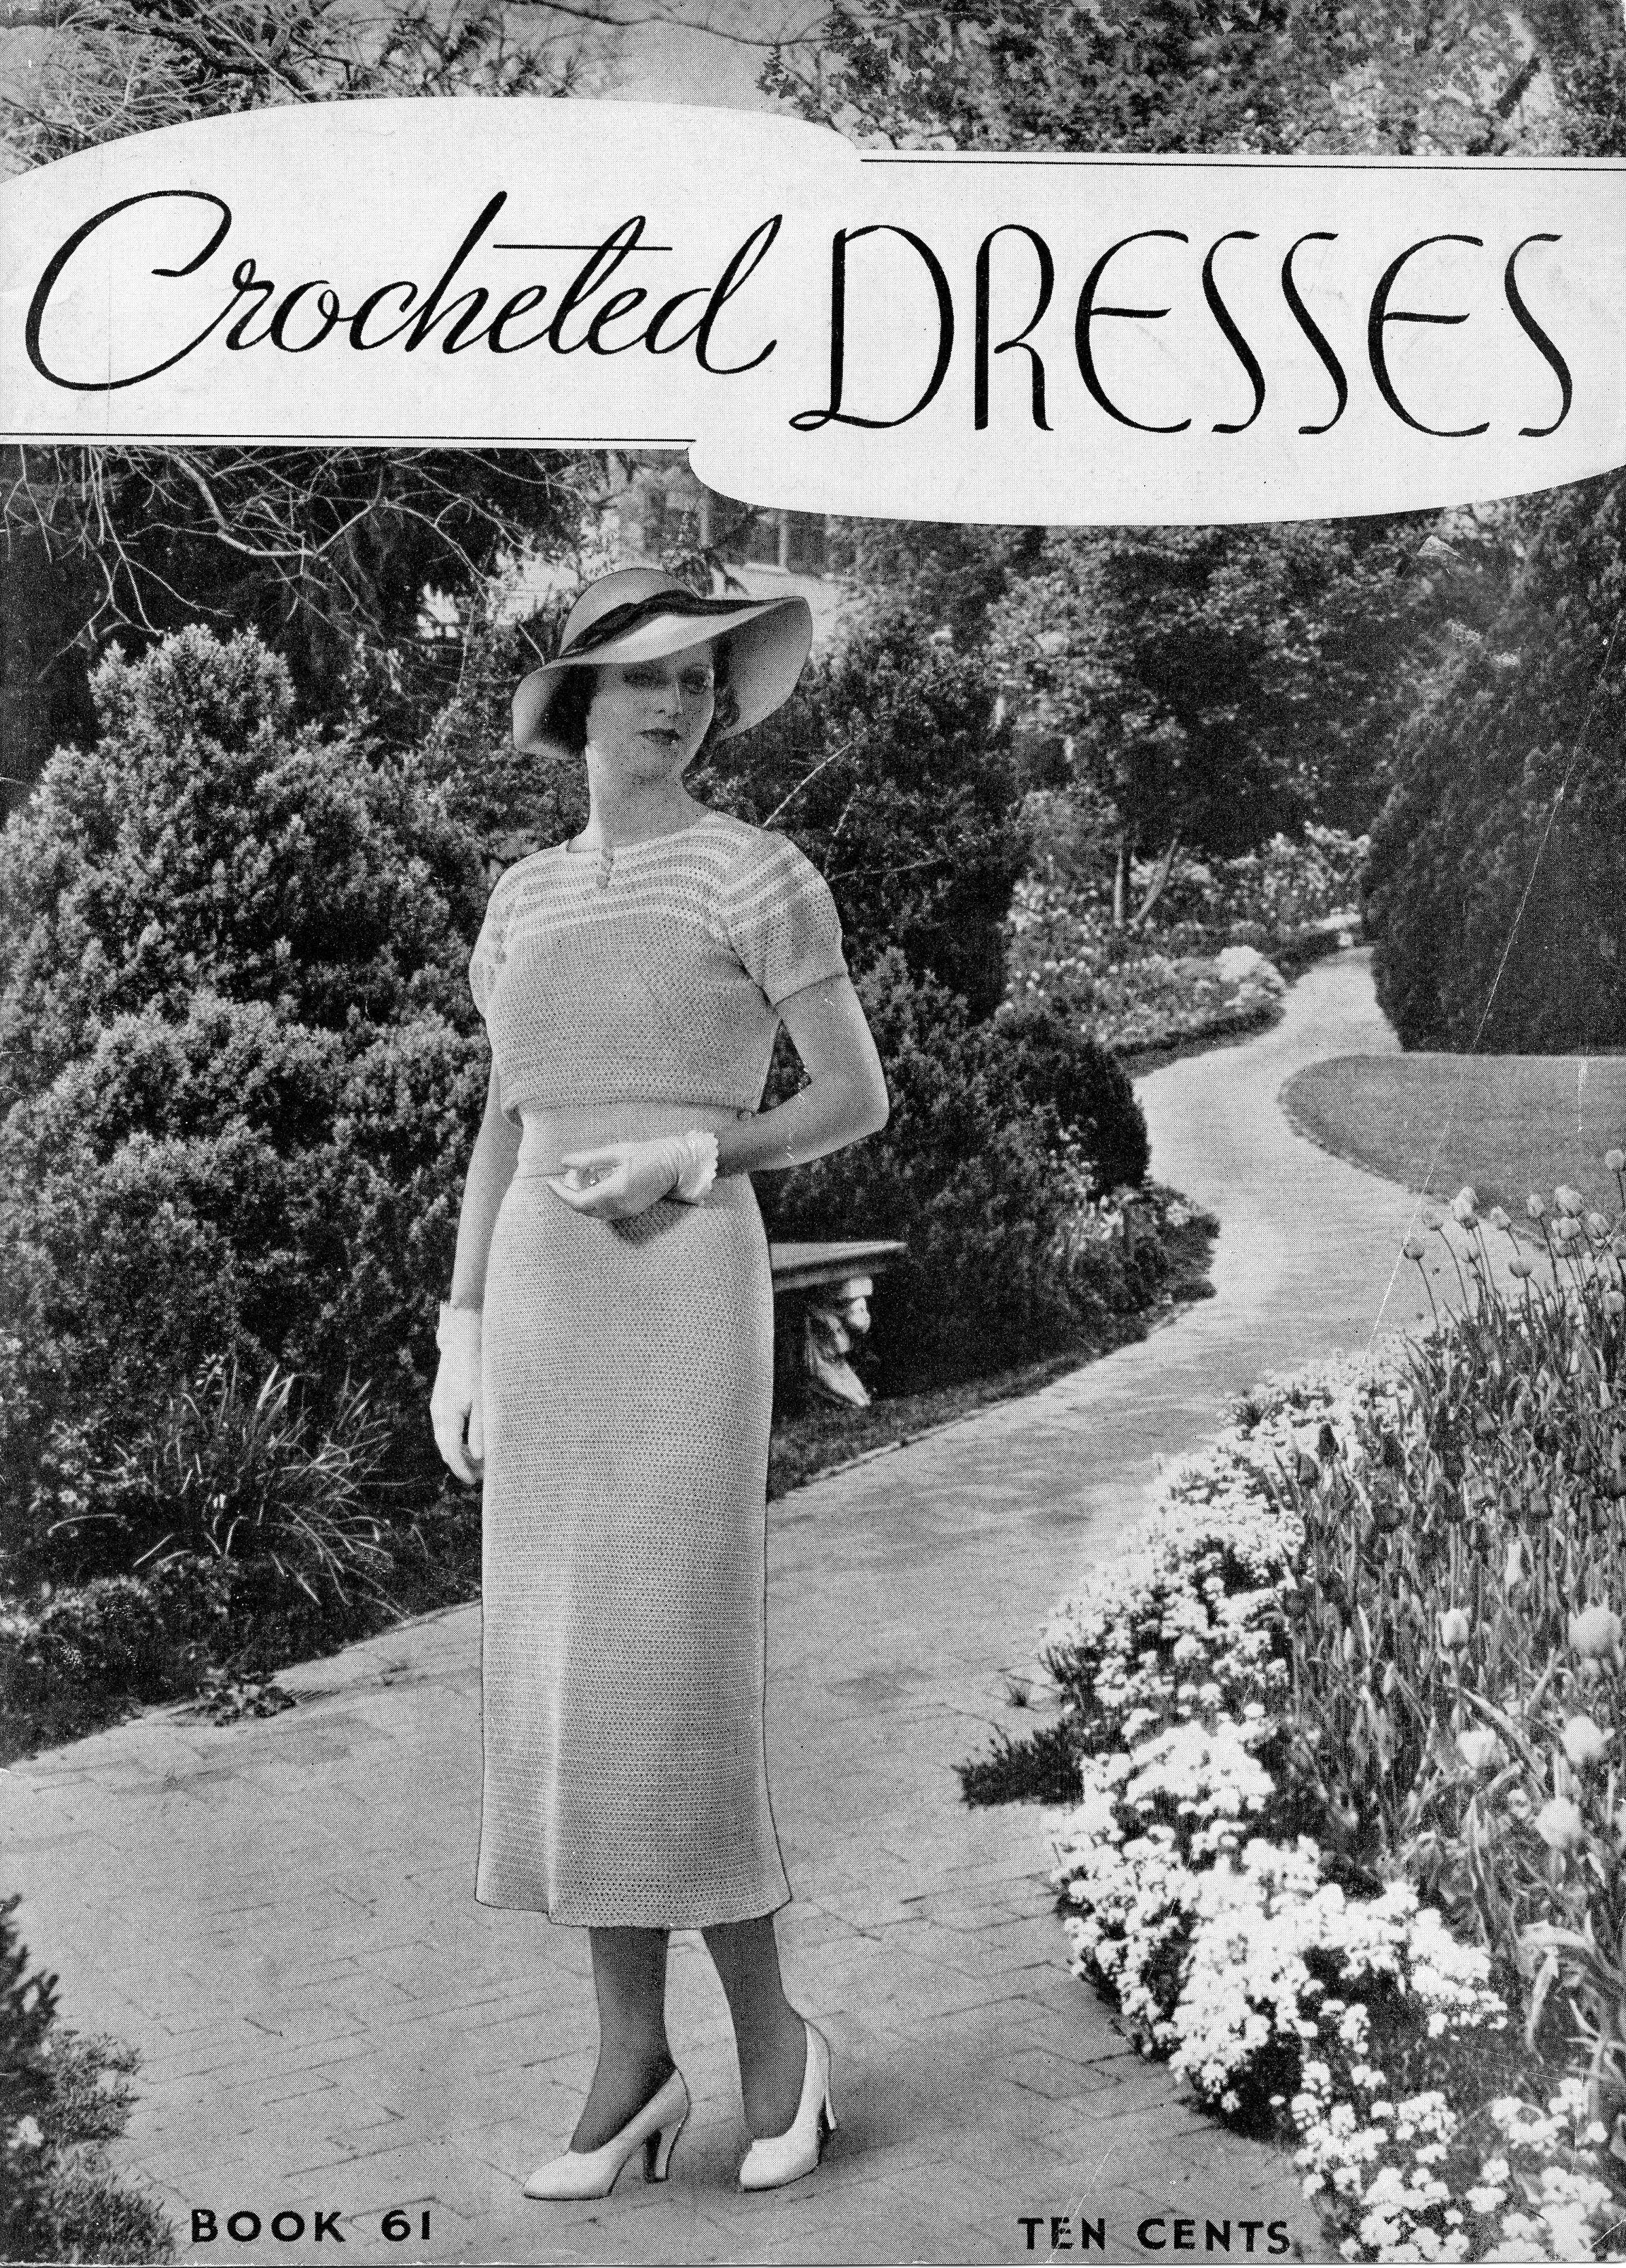 Garden Party Dress 1930s Crochet Pattern 30s Skirt Top Patterns Starshop Vintage Vintage Dress Patterns Crochet Skirt Pattern Garden Party Dress [ 3212 x 2303 Pixel ]